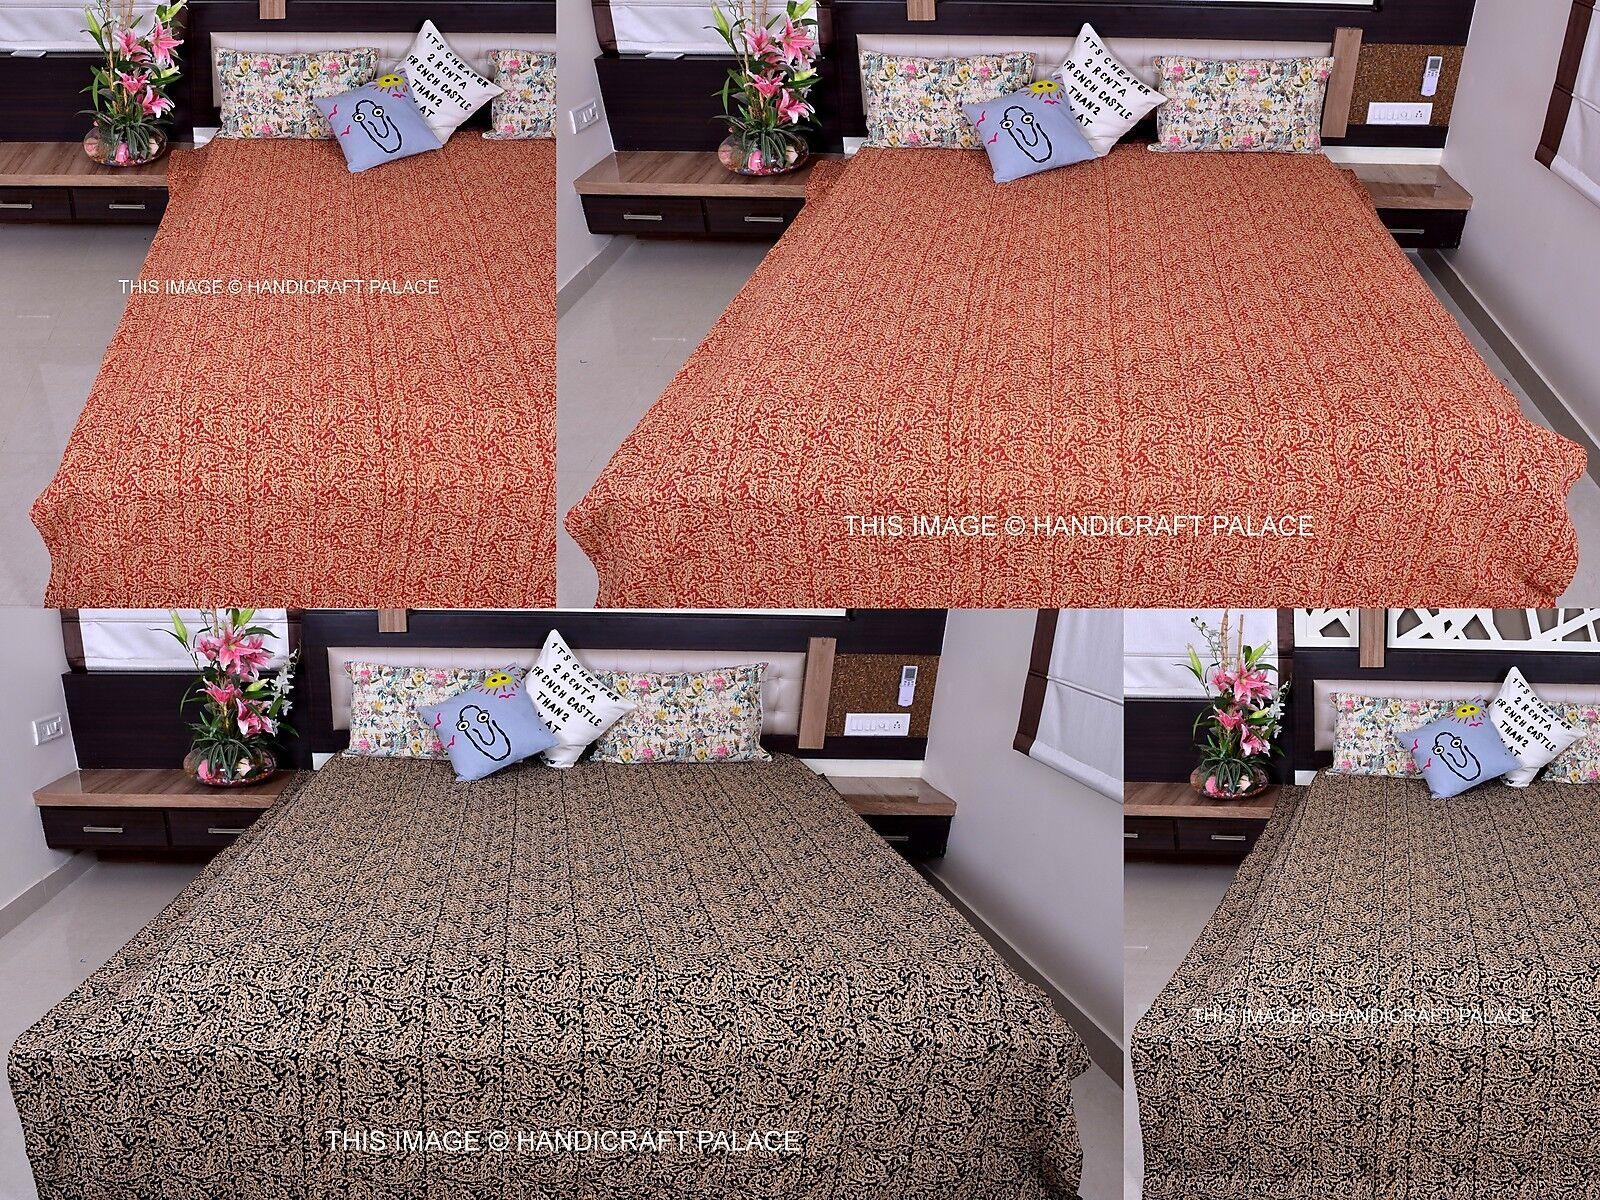 Indian Cotton Queen Quilt Paisley Design Kantha Work Bedspread Blanket Throw